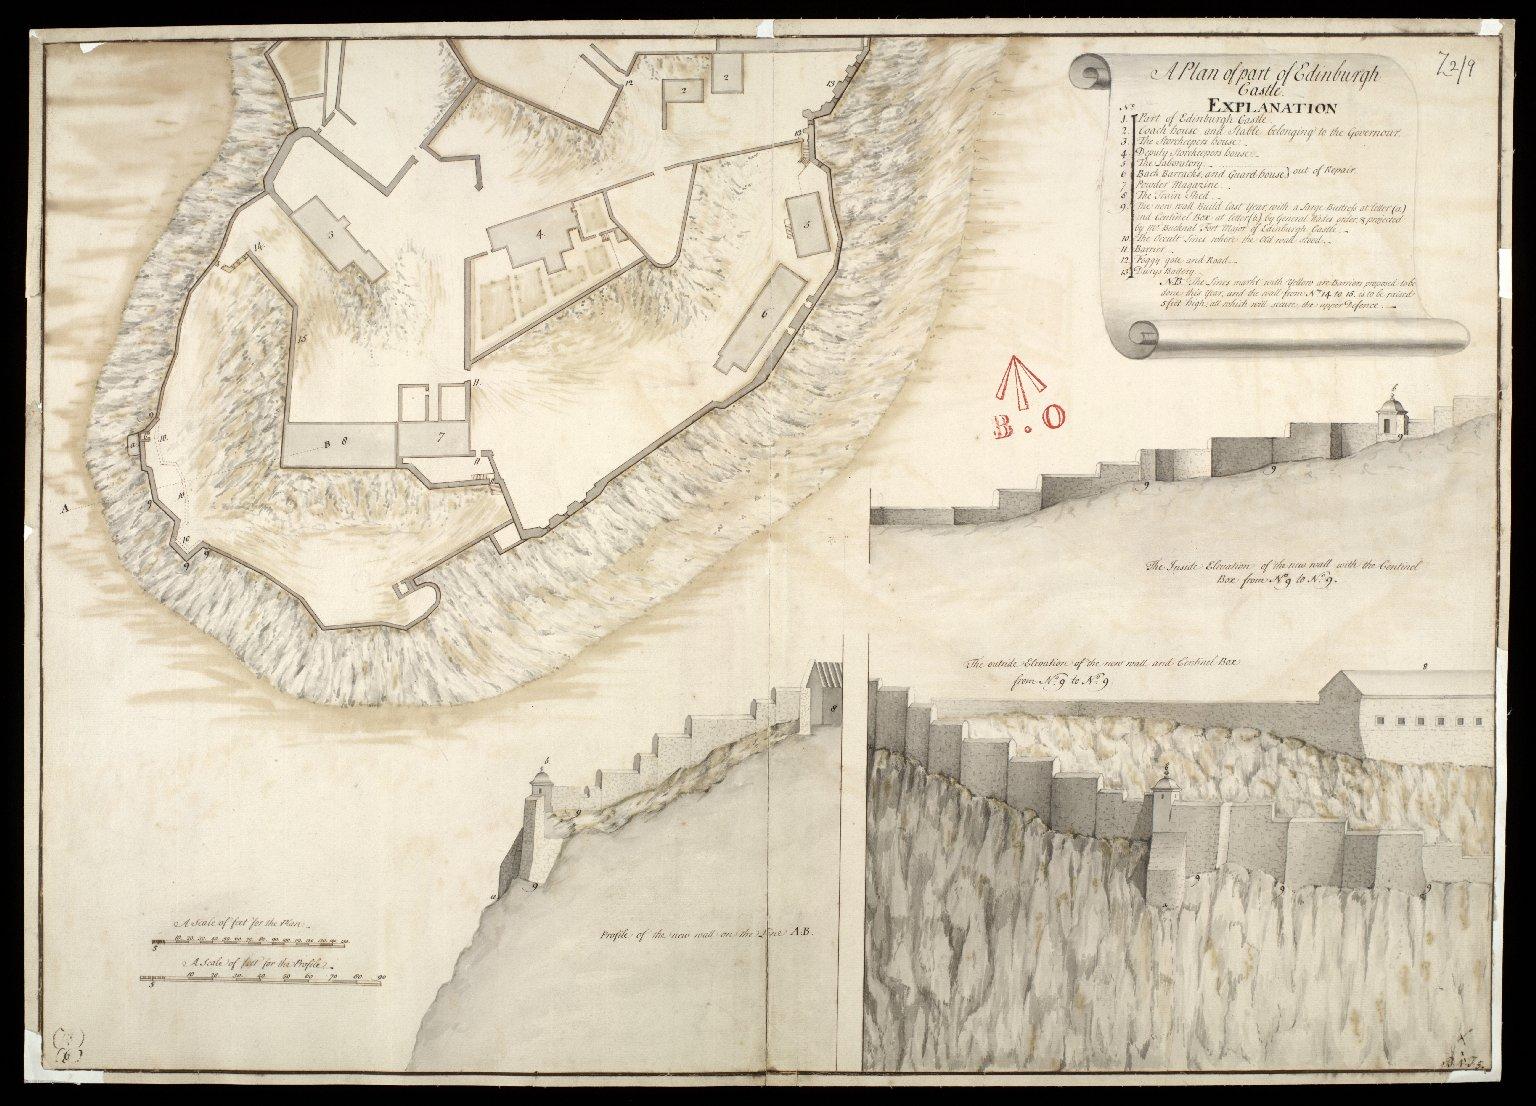 A Plan of Part of Edinburgh Castle [1 of 1]